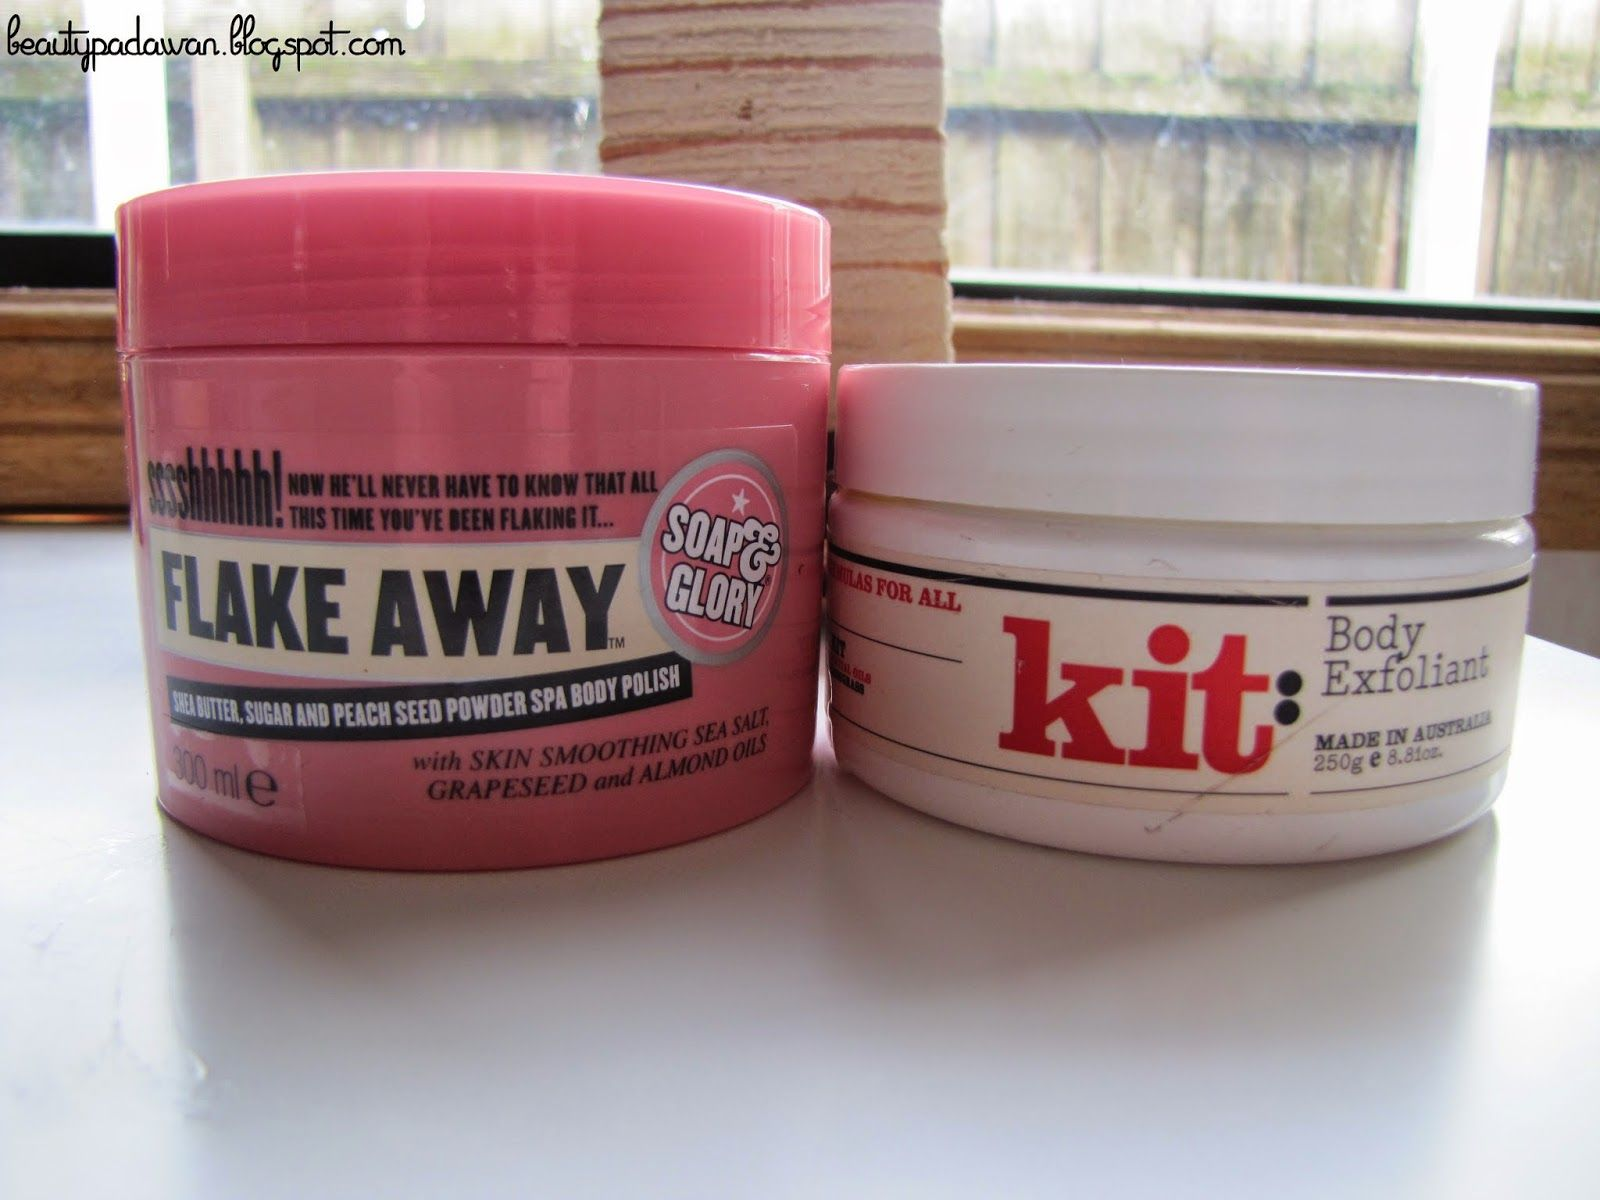 Compare the Pair: Kit Cosmetic's Body Exfoliant vs. Soap